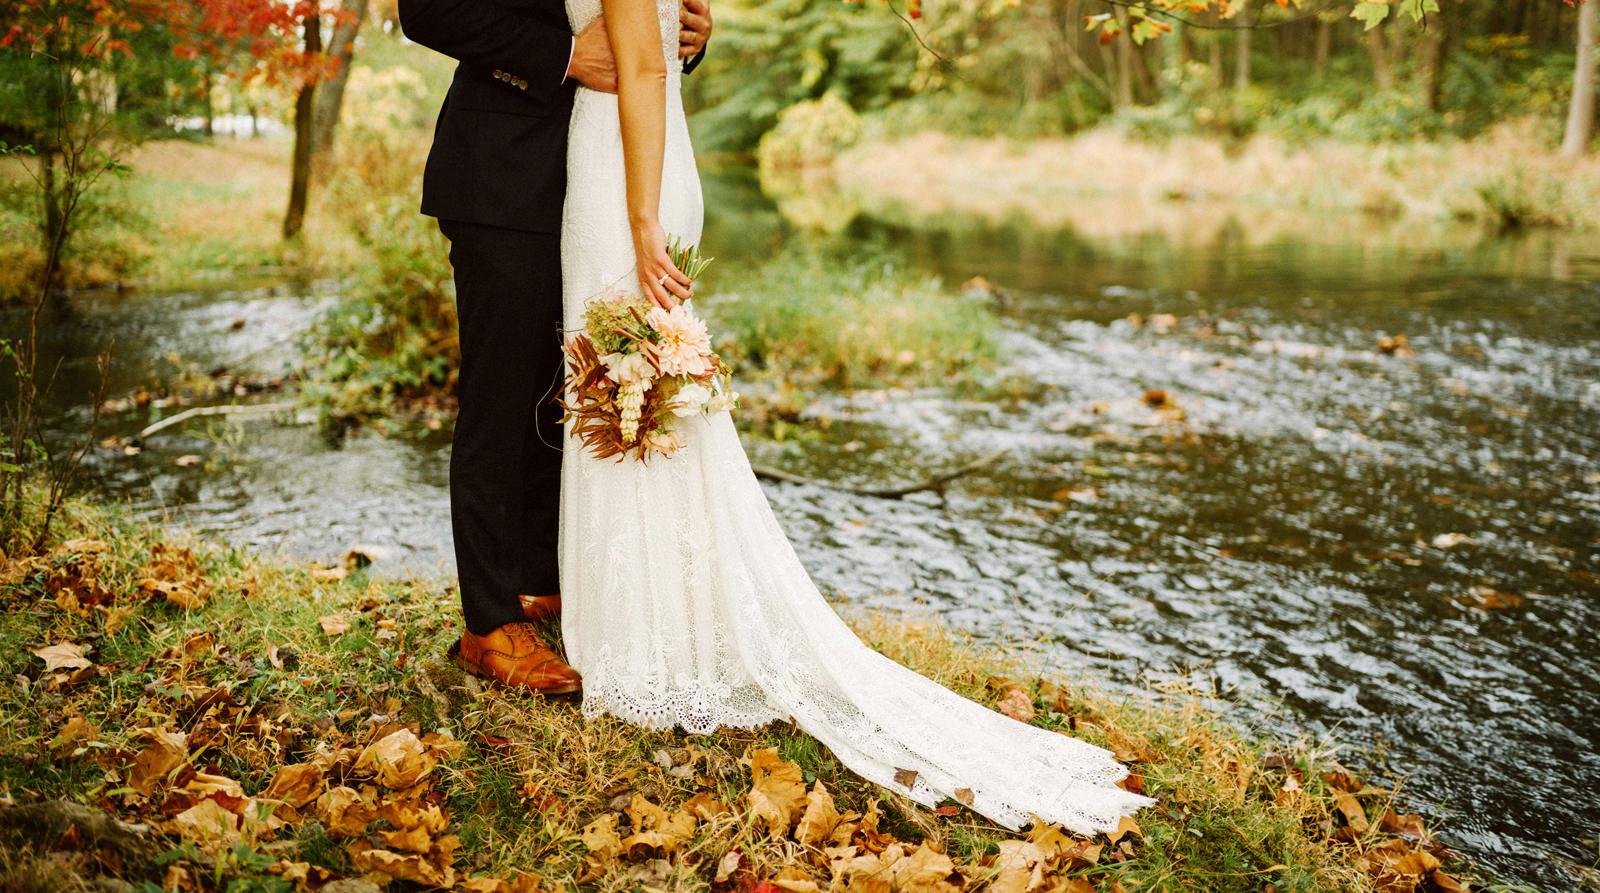 bridgeport-wedding-102 BRIDGEPORT, CONNECTICUT BACKYARD WEDDING